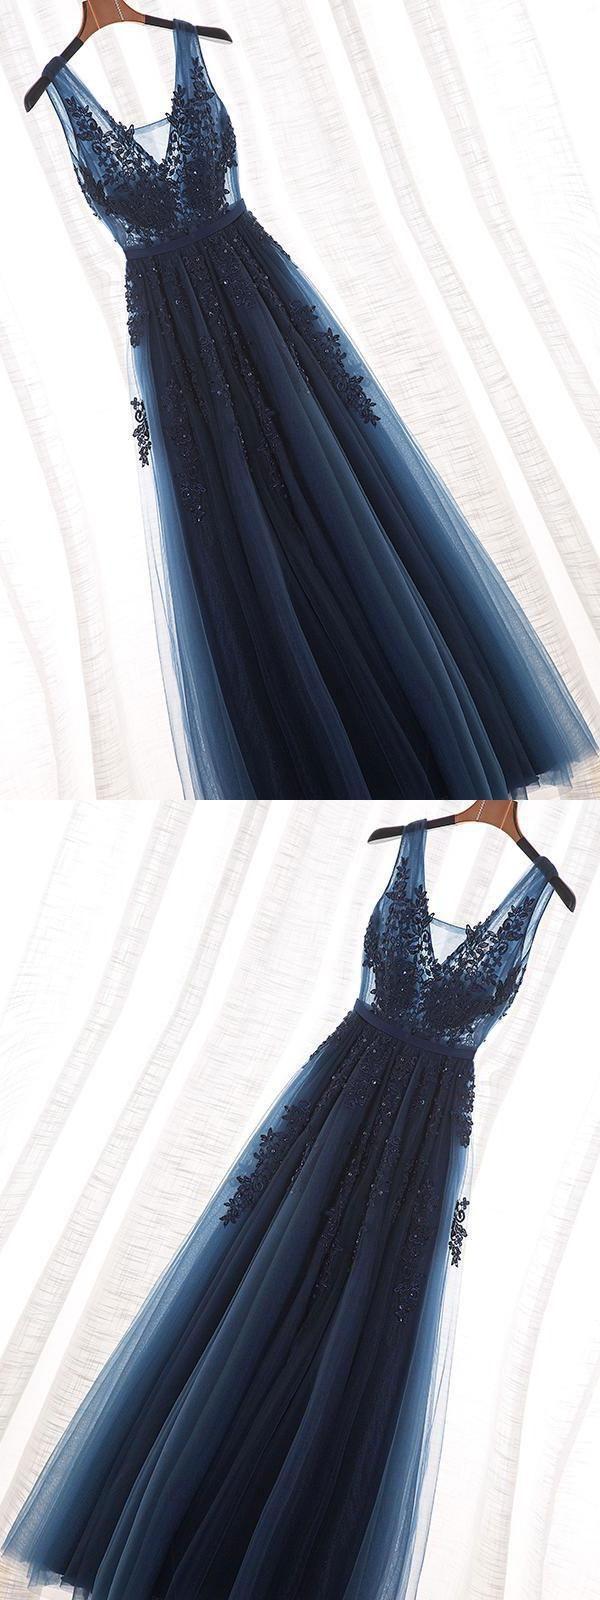 Soft Blue Prom Dress, Long Prom Dress, Navy Blue Prom Dress, Lace Prom Dress